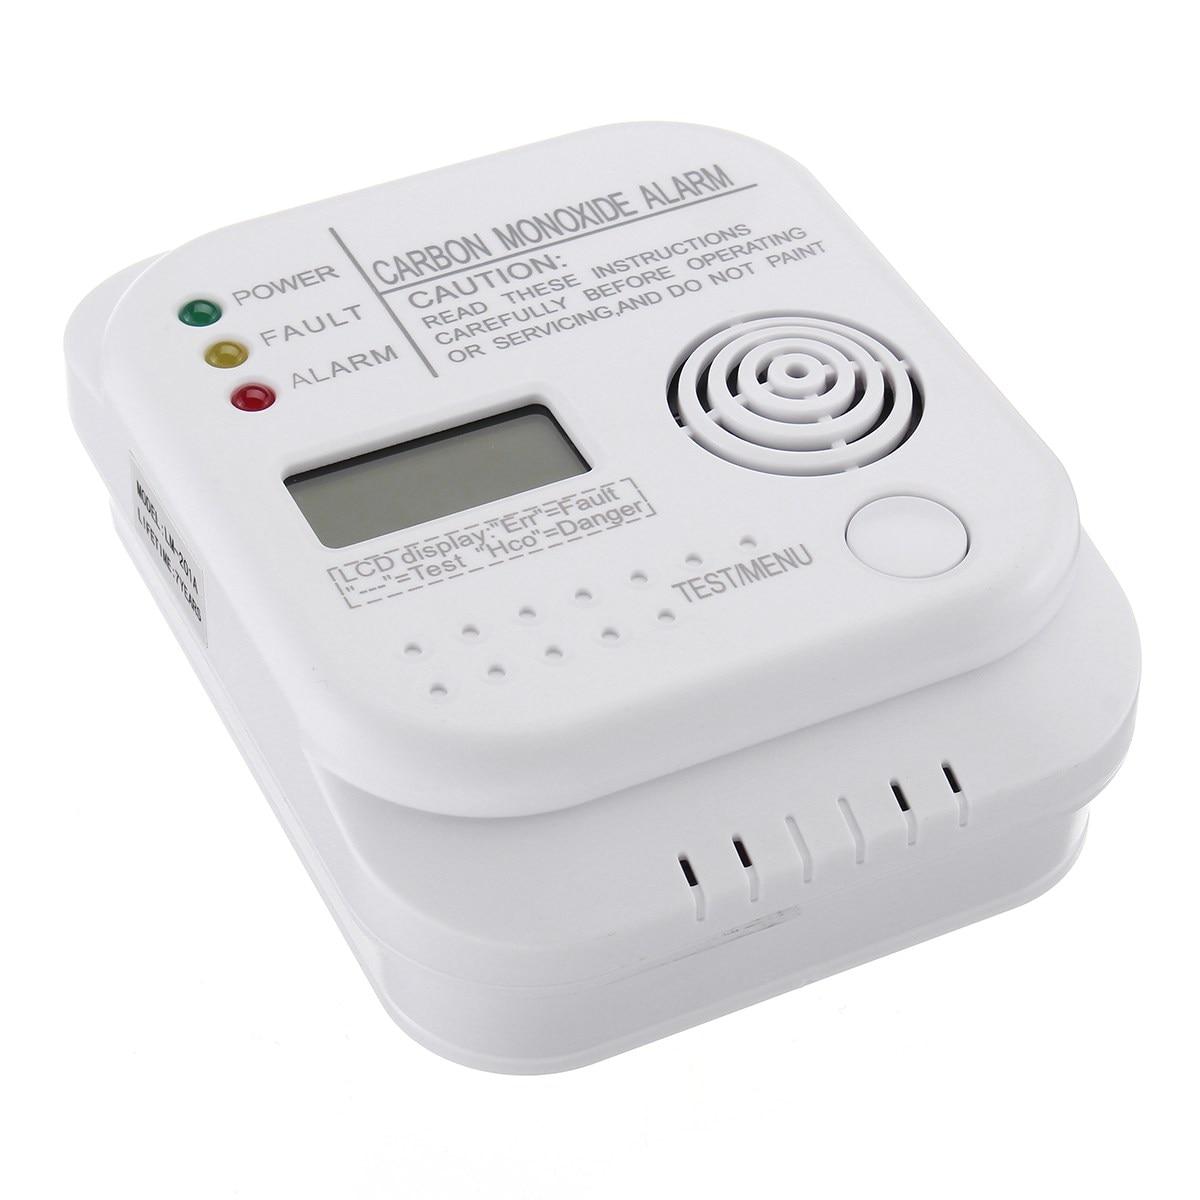 NEW Safurance CO Carbon Monoxide Alarm Detector LCD Digital Home Security Indepedent Sensor Safety new safurance wireless digital natural gas detector alarm clock sensor propanectester high sensitive home security